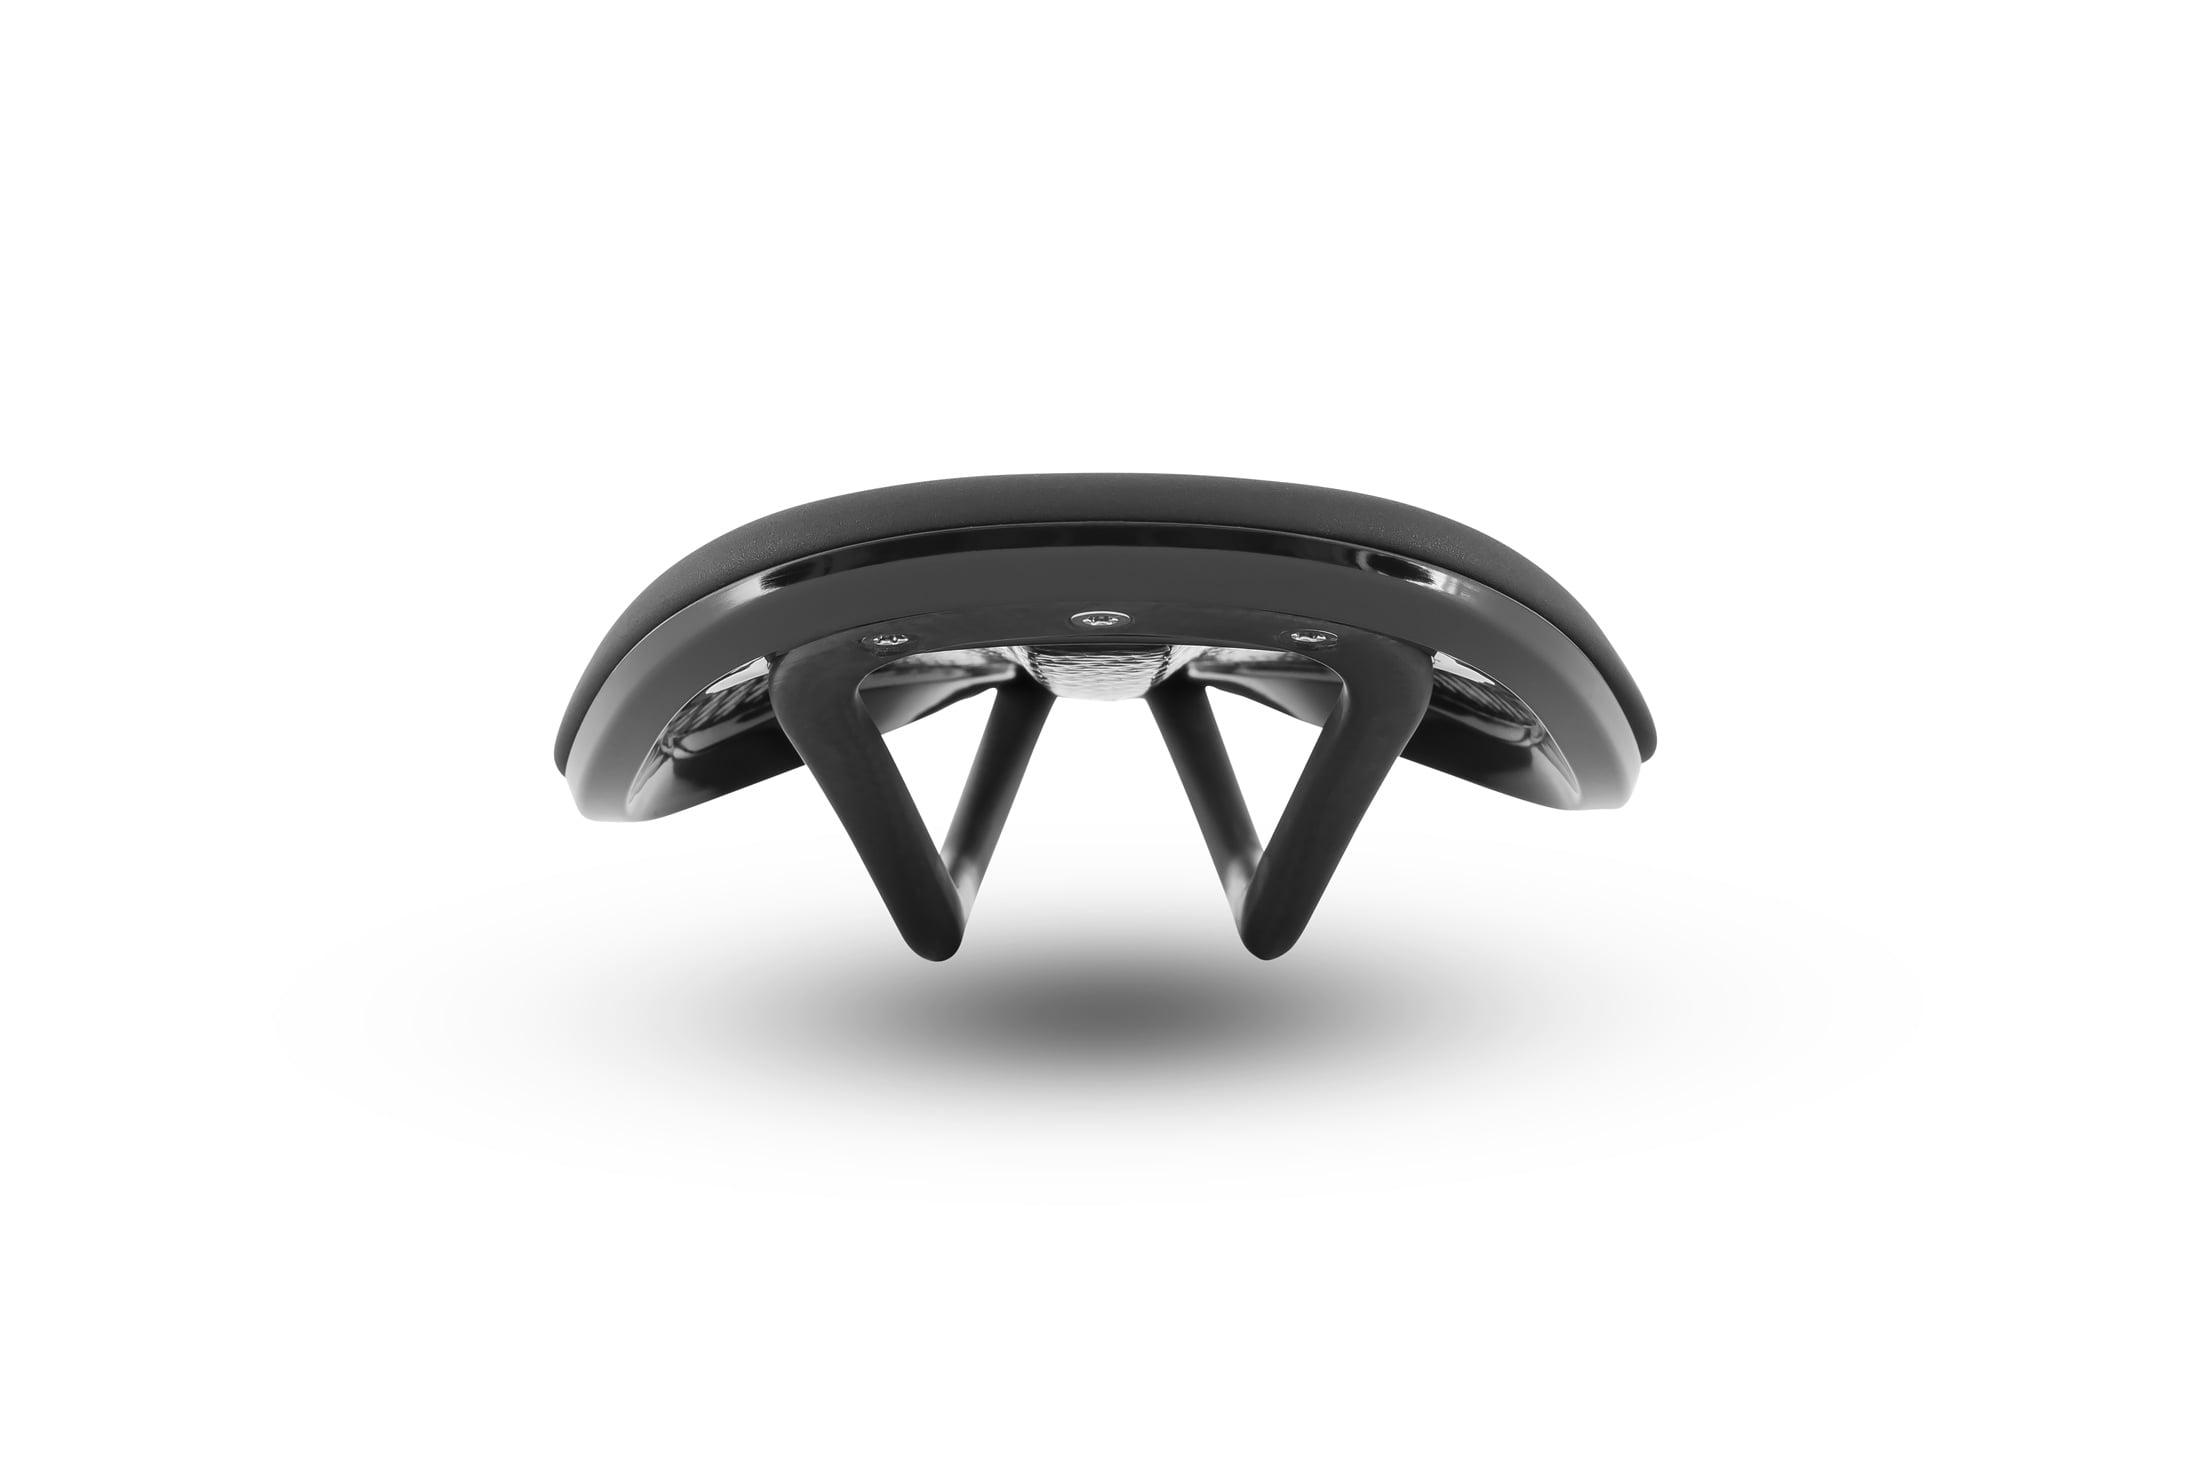 reform custom bike saddle cycling mouldable _AD_1135-copy